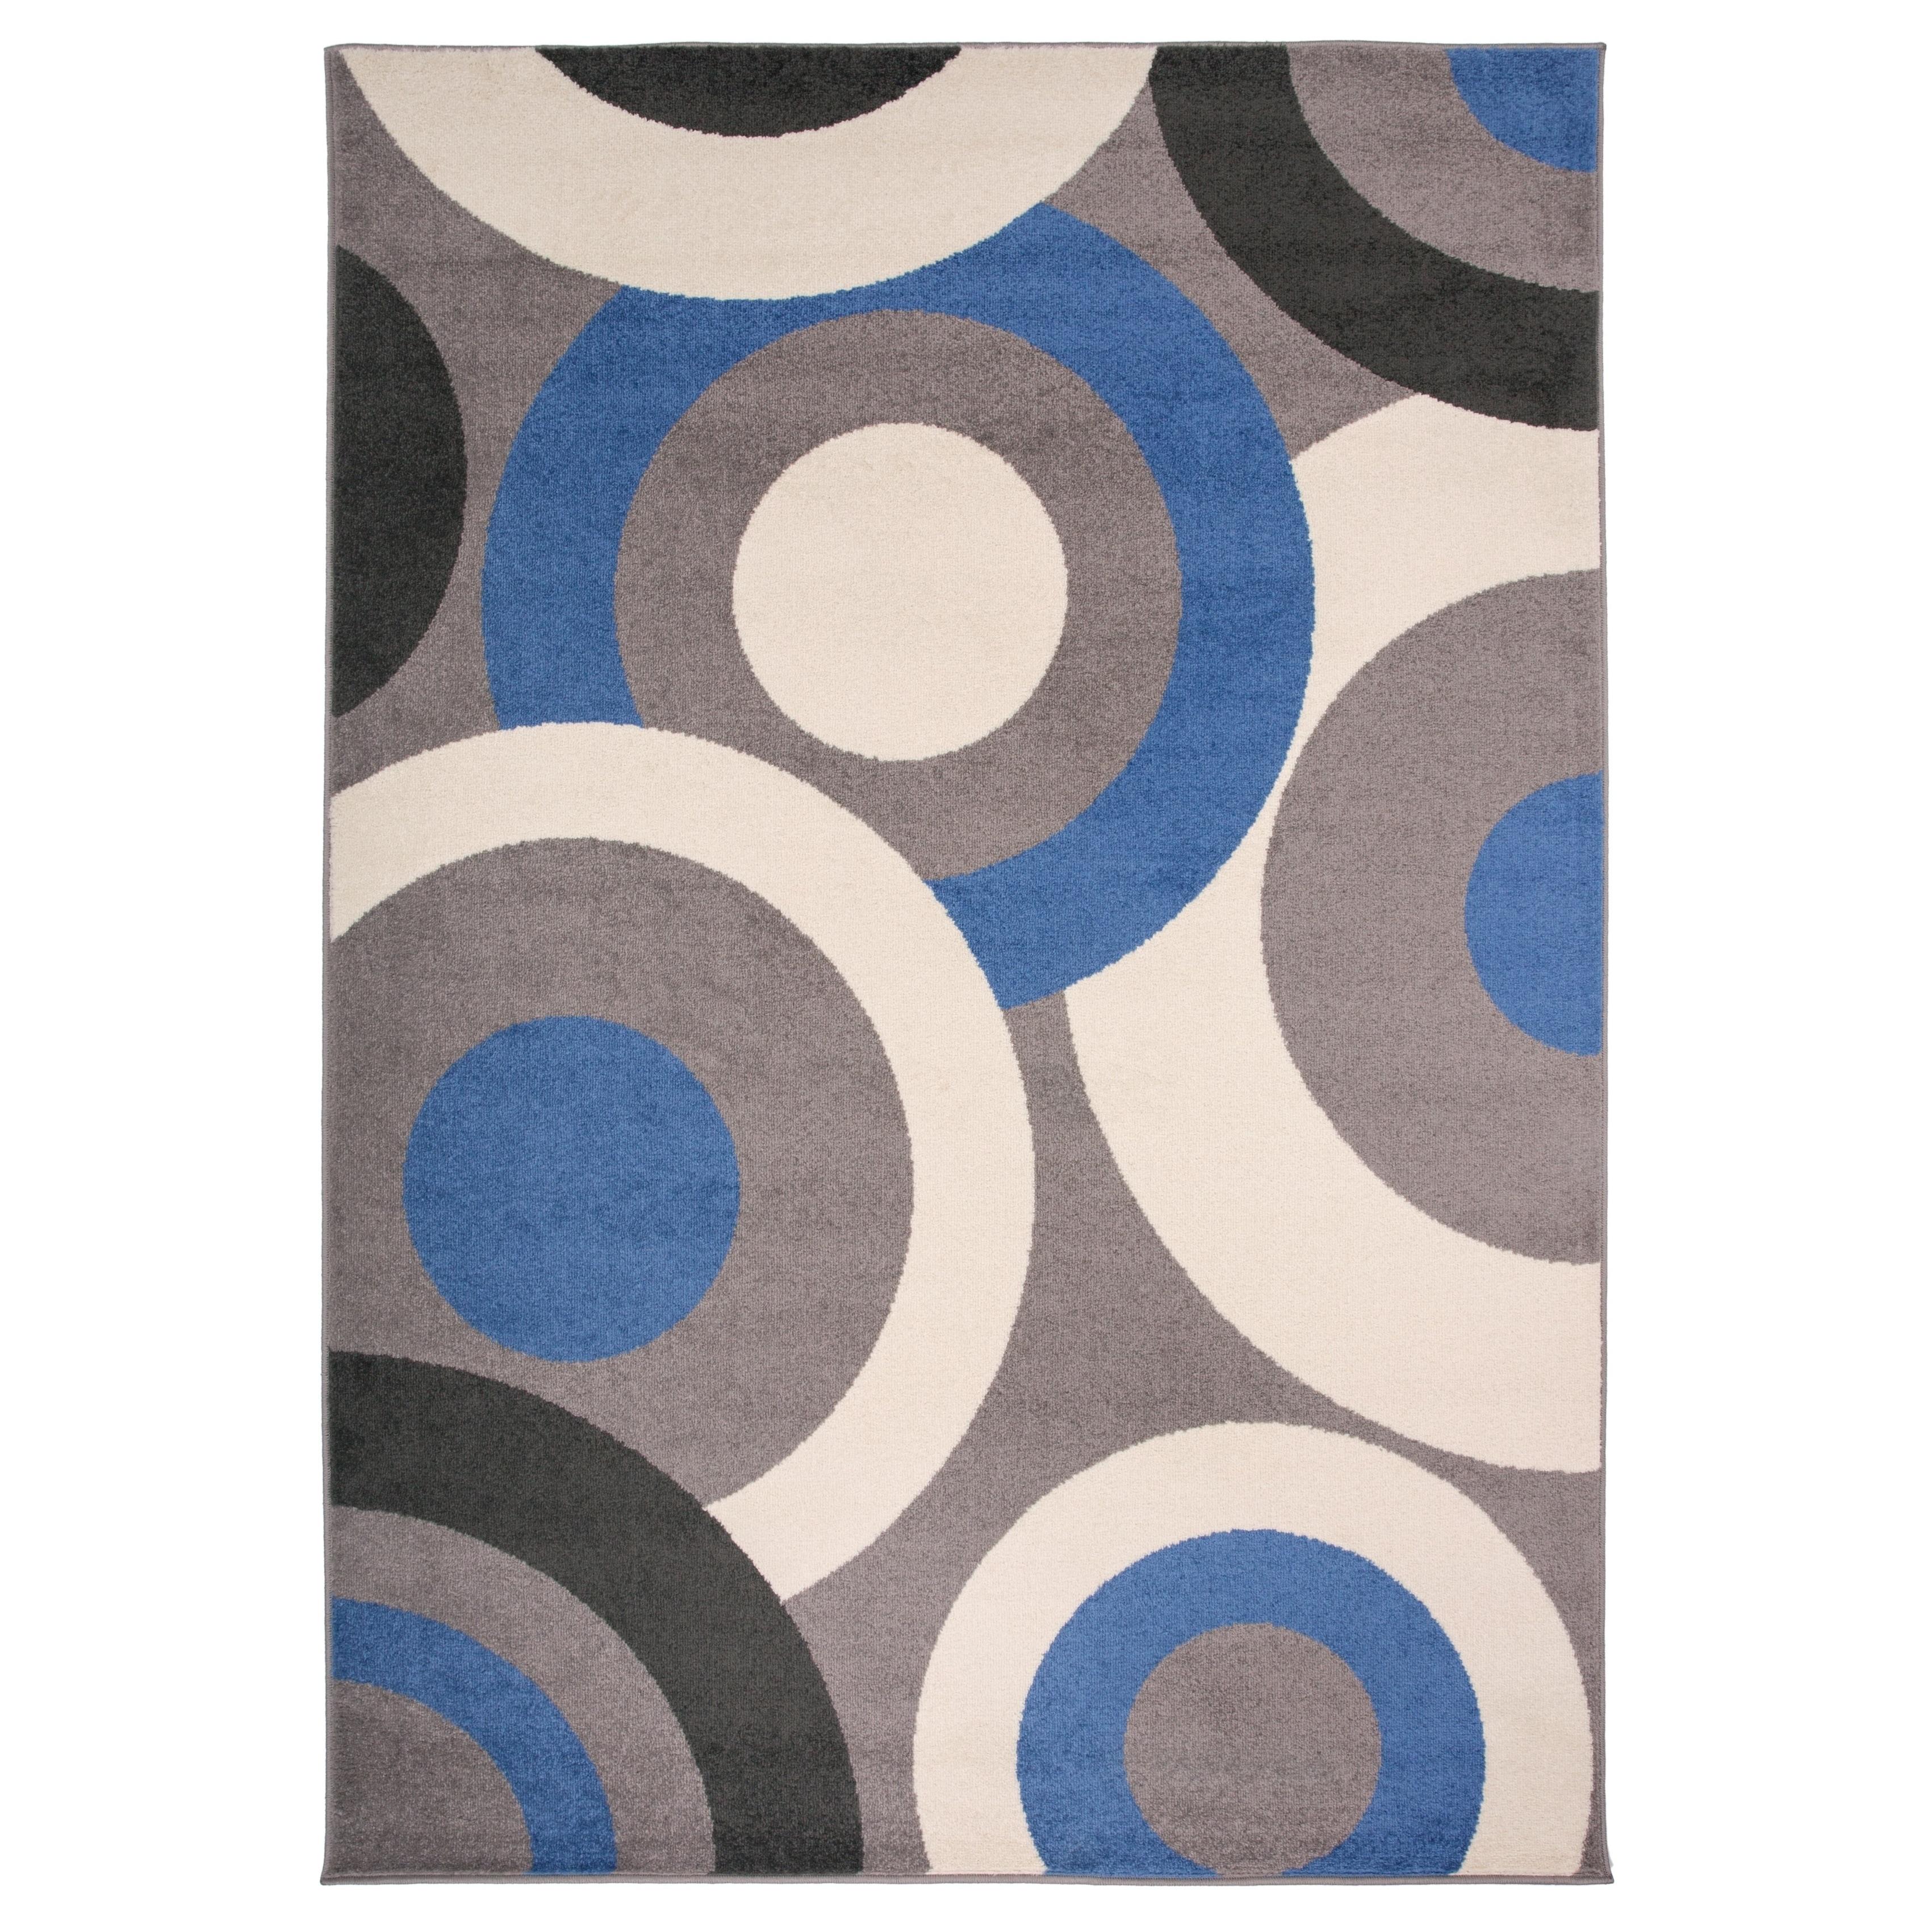 Circles Area Rug Blue